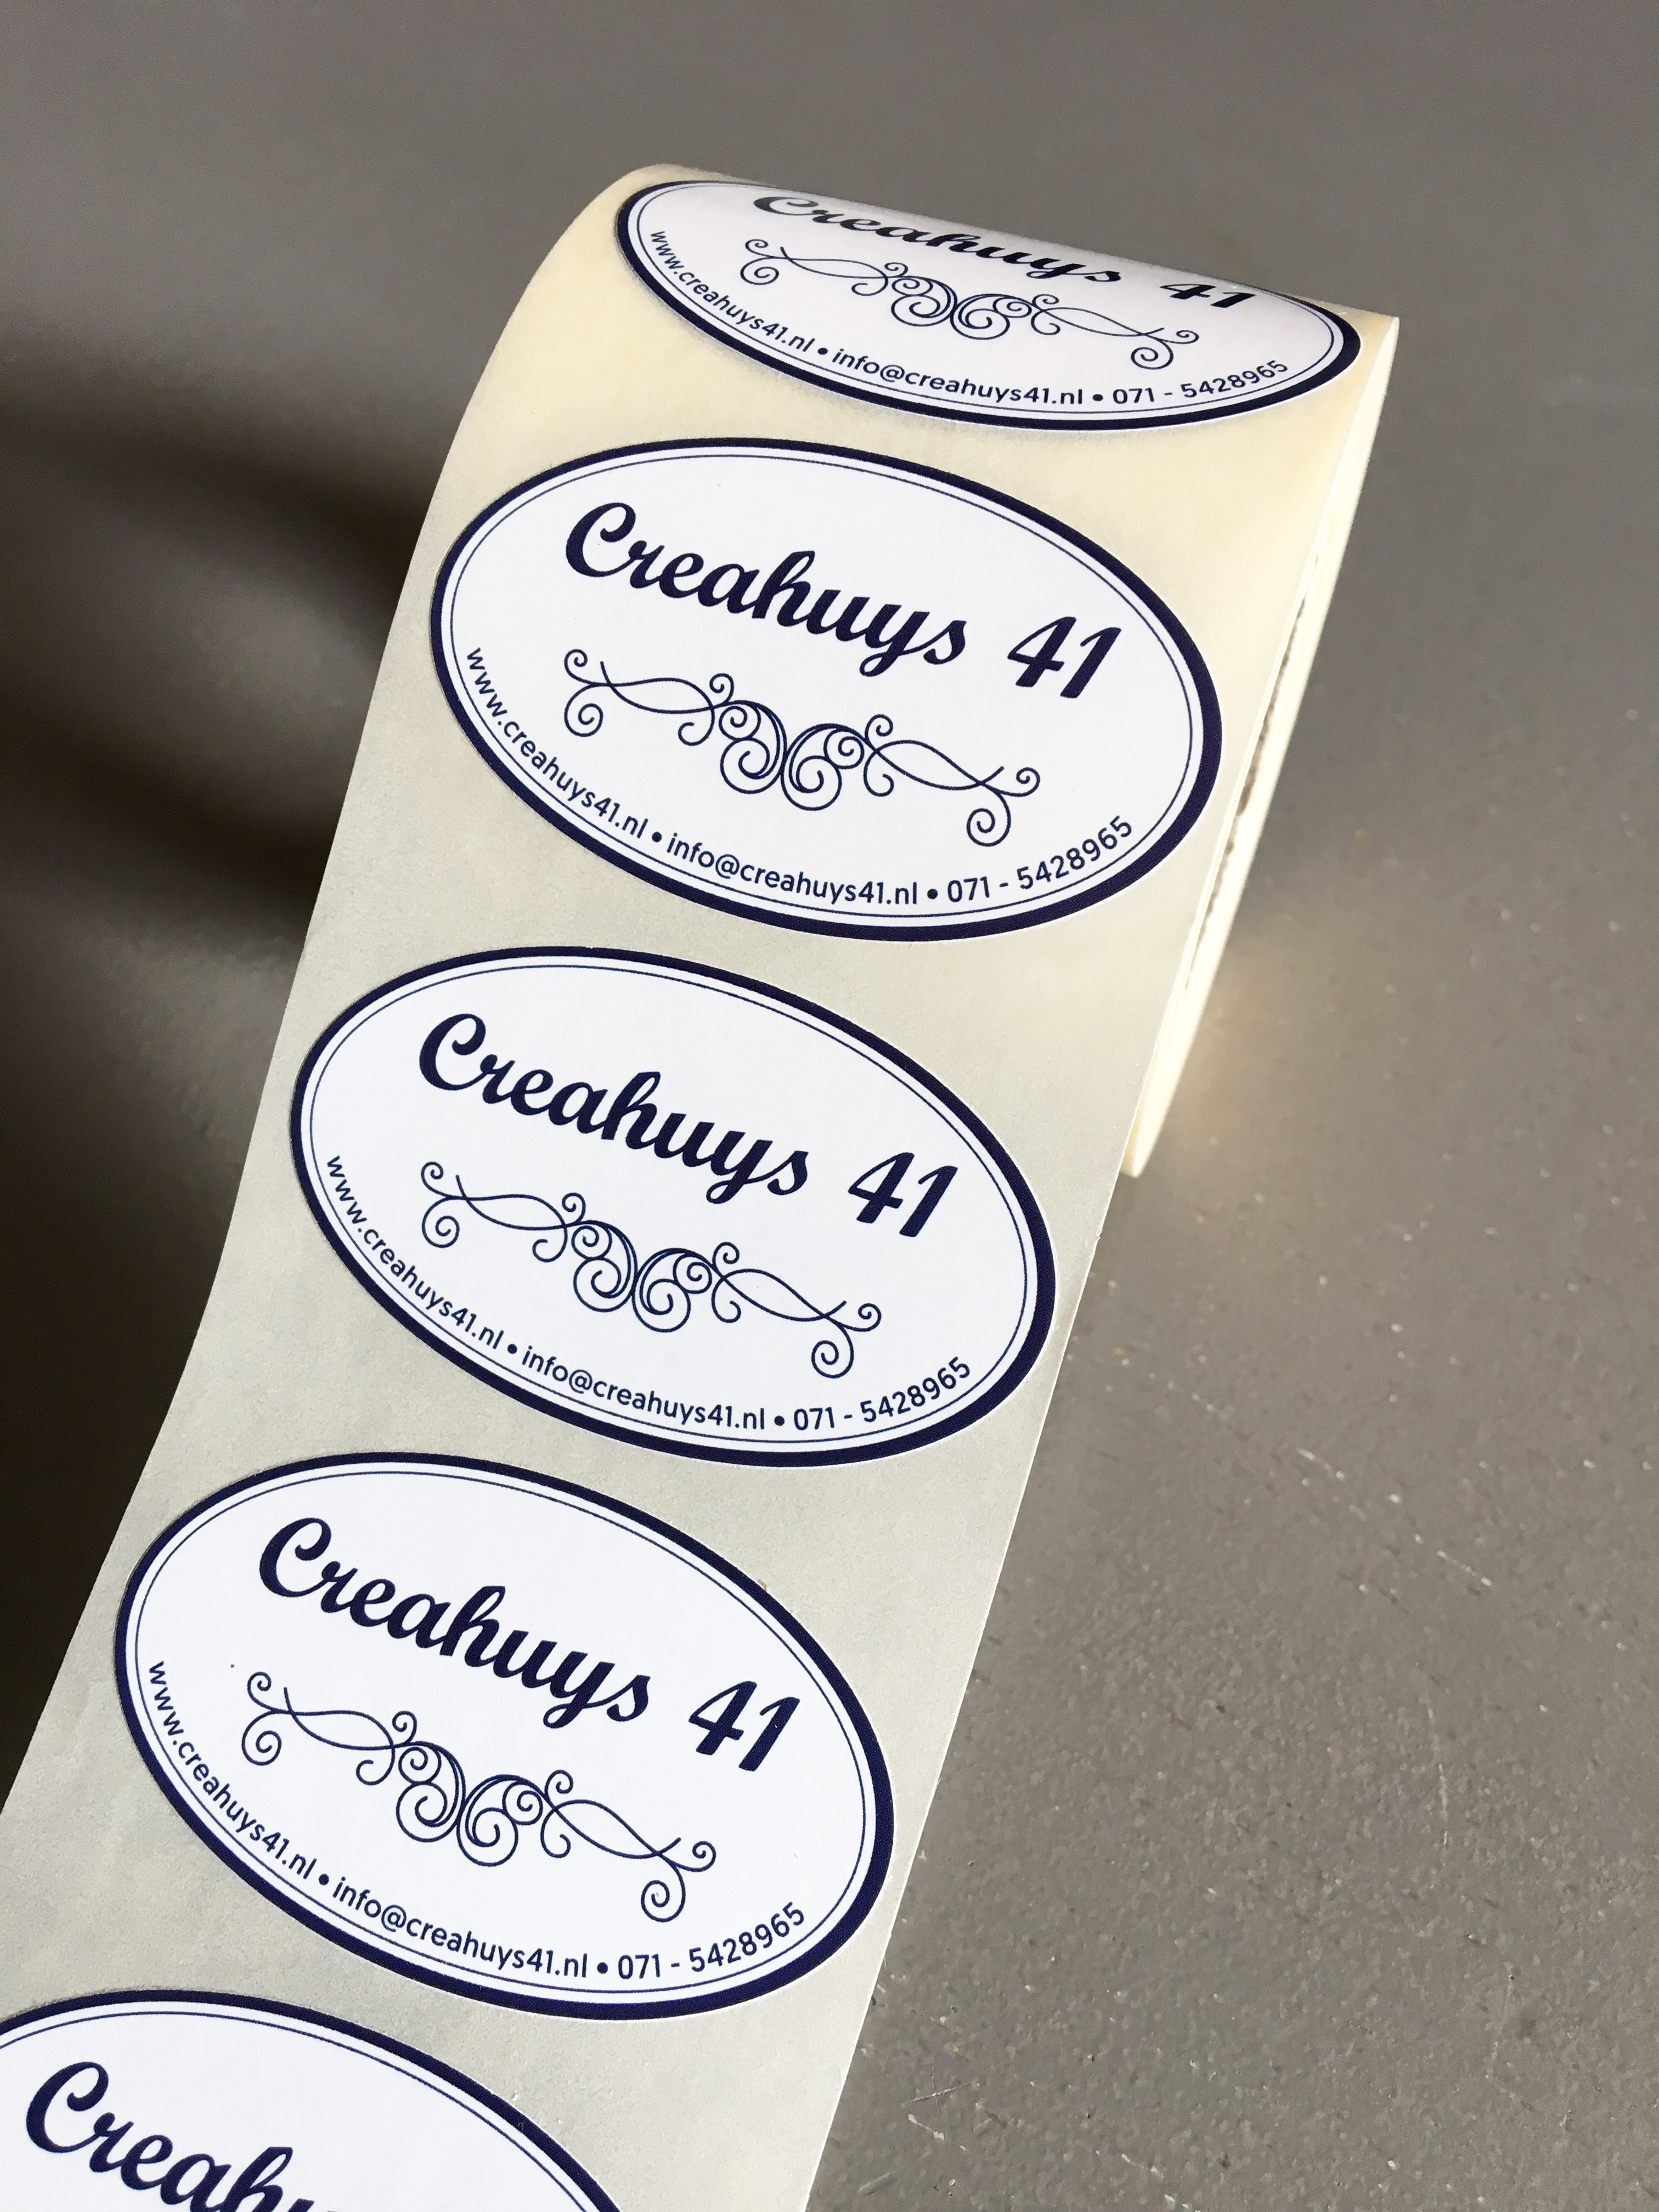 Ovale stickers (Creahuys 41)